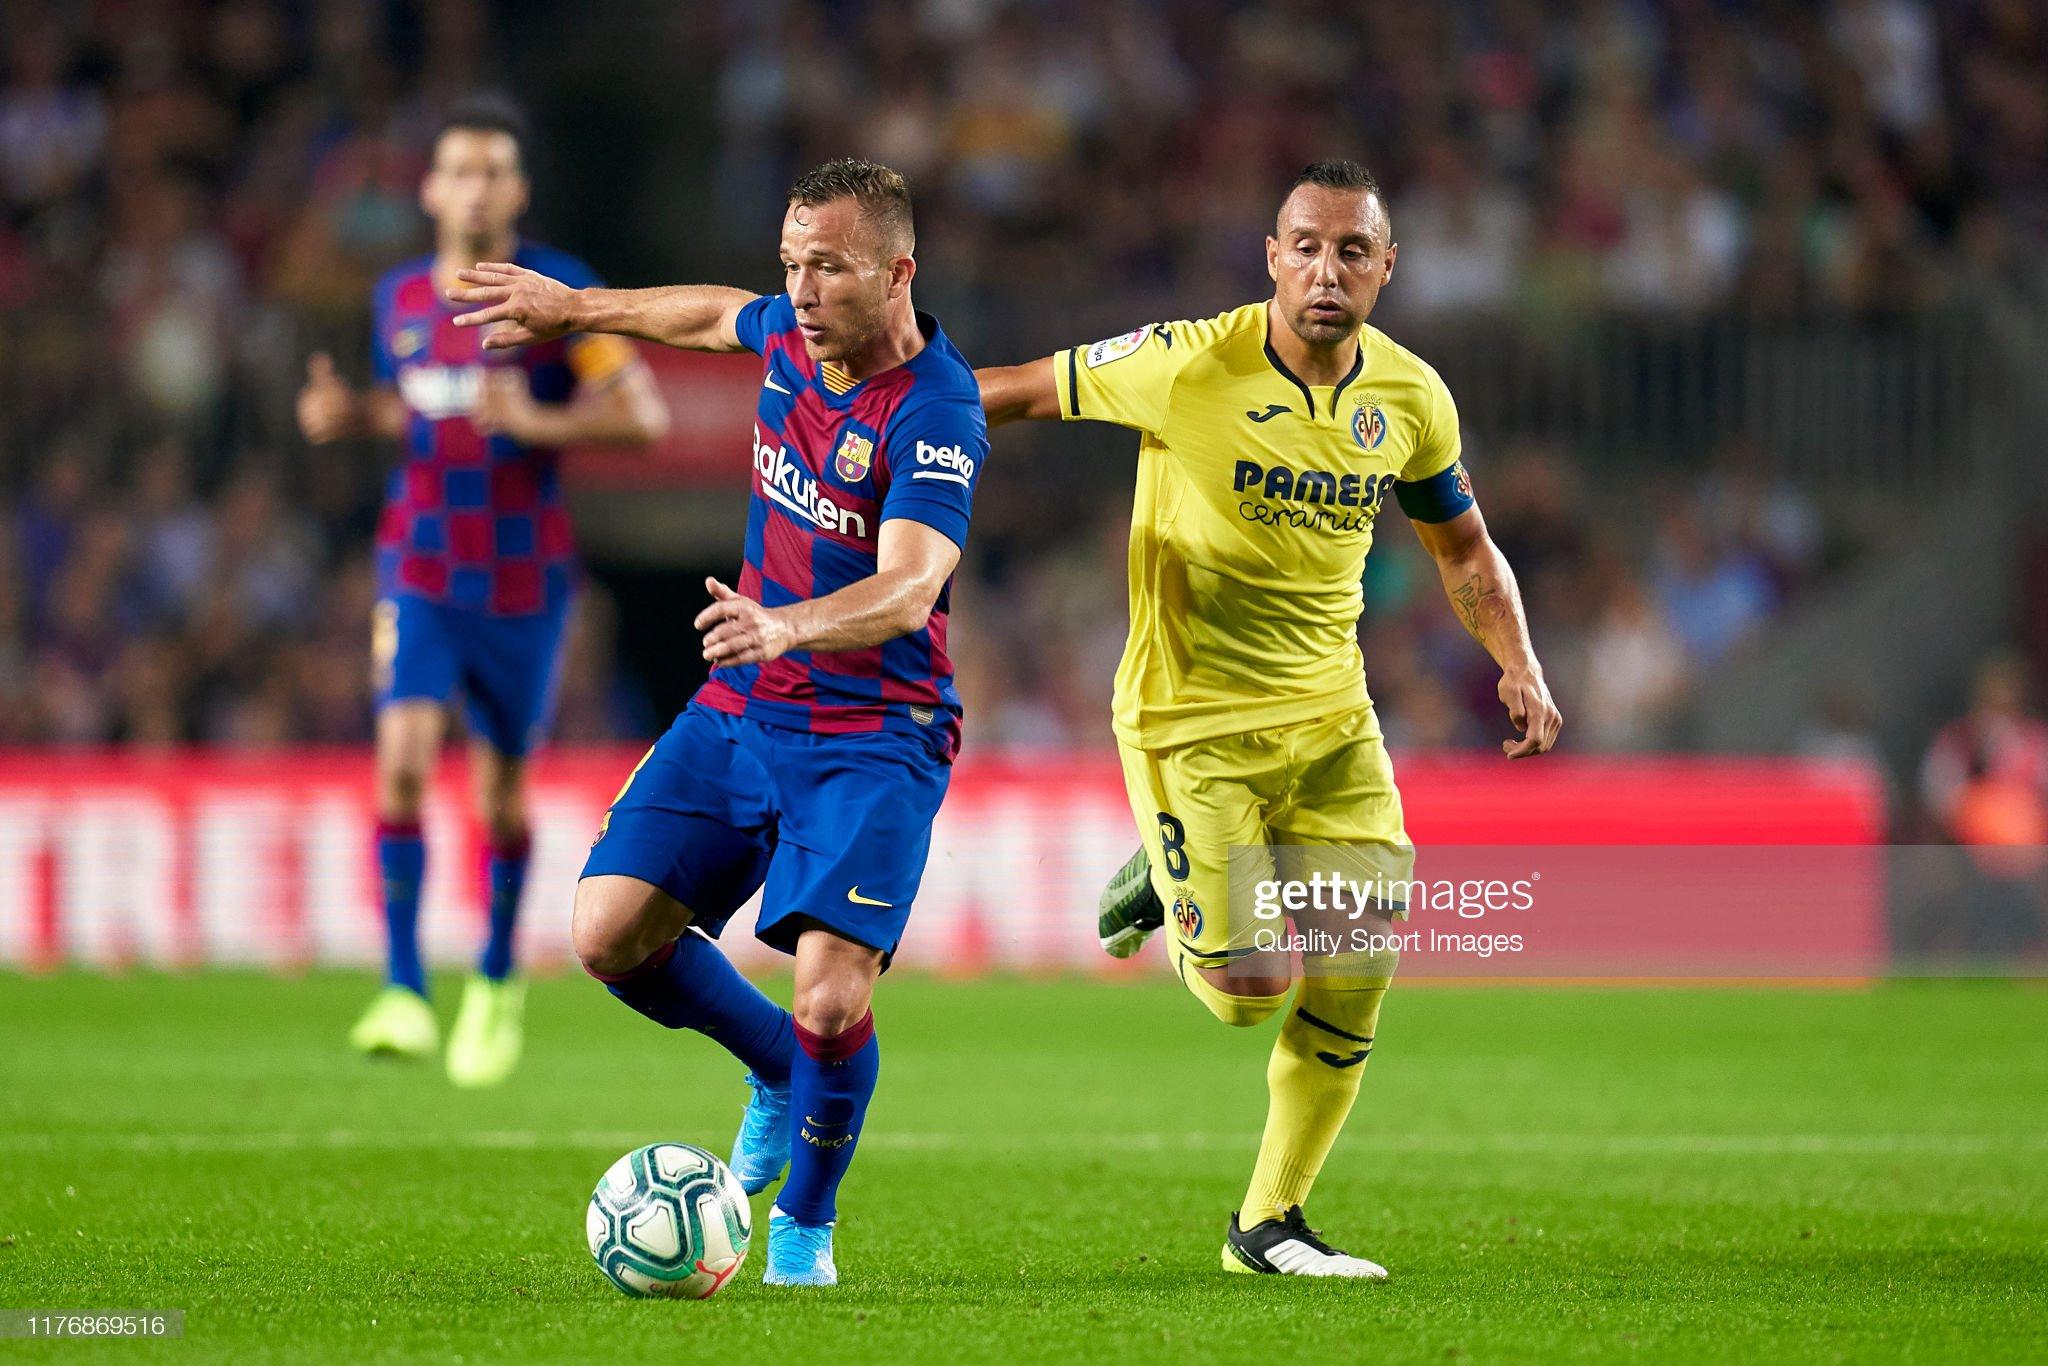 صور مباراة : برشلونة - فياريال 2-1 ( 24-09-2019 )  Arthur-of-fc-barcelona-competes-for-the-ball-with-santi-cazorla-of-picture-id1176869516?s=2048x2048